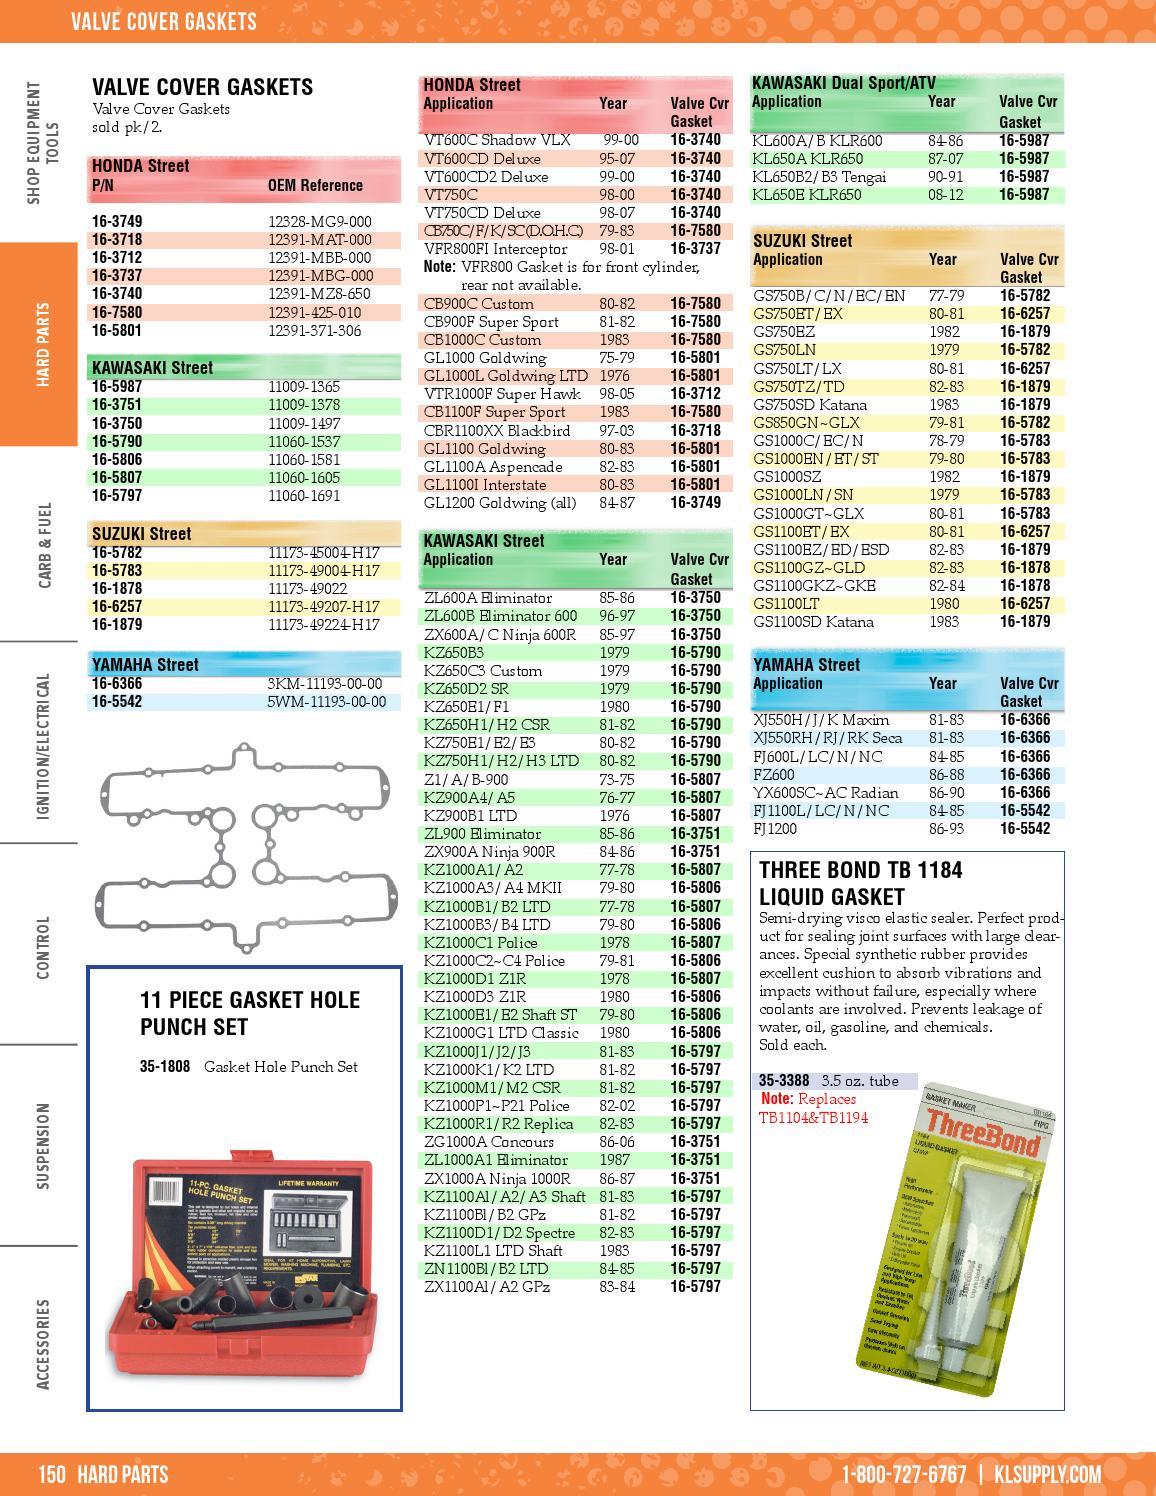 HONDA 12391-MG9-000 GOLDWING GL1200 84-87 SEALED COVER GASKET